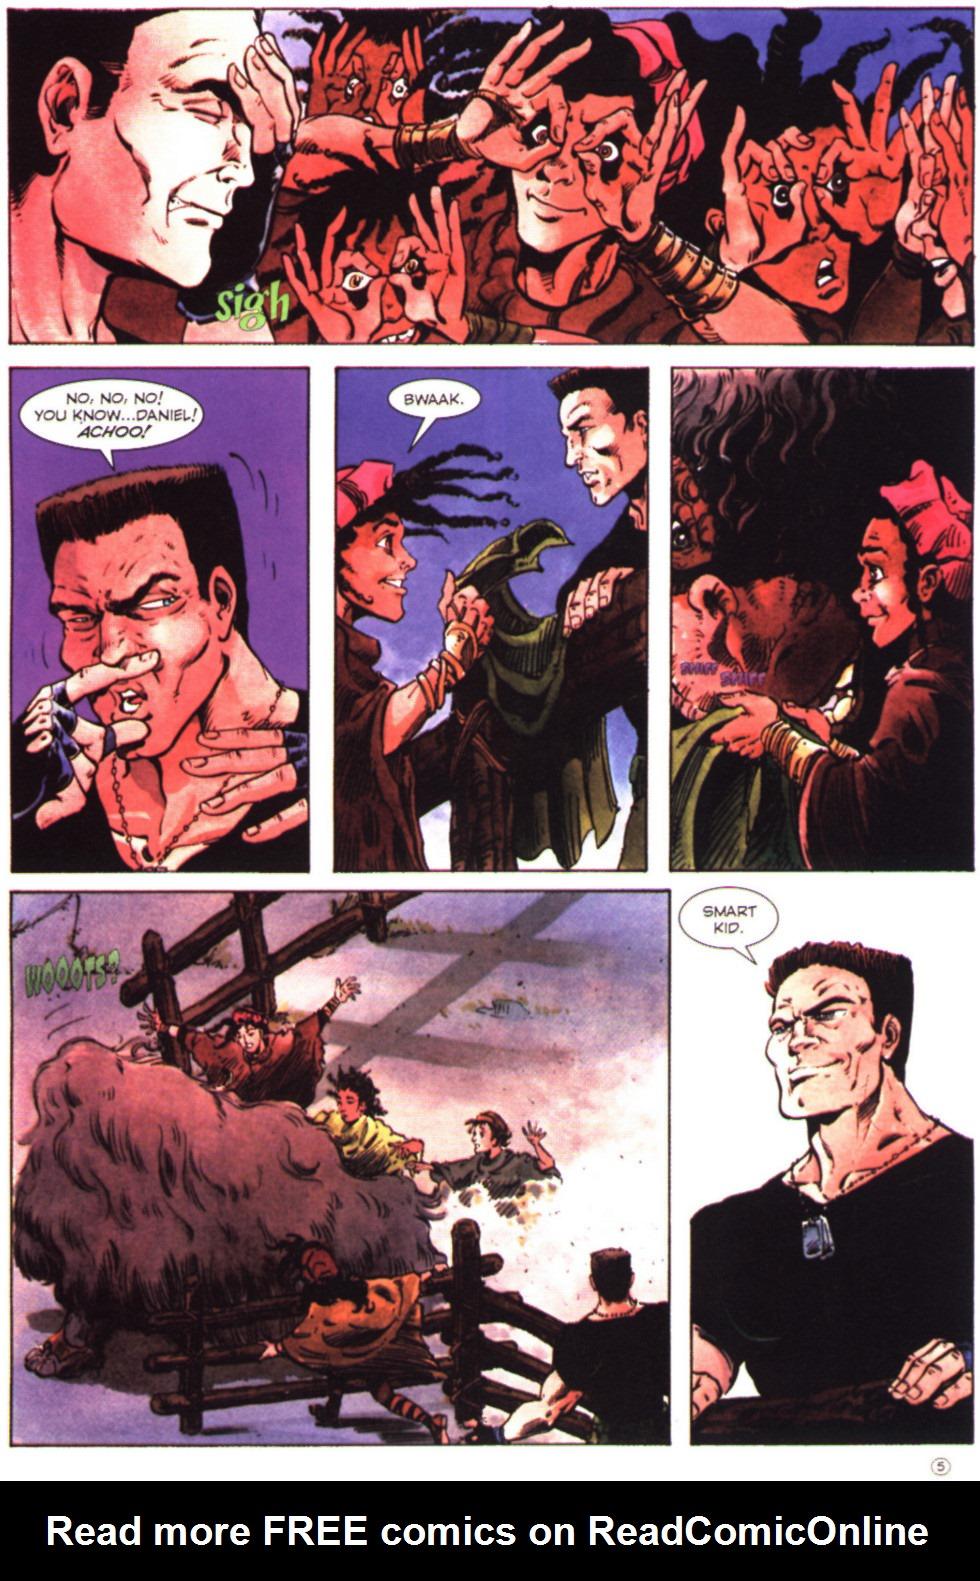 Read online Stargate comic -  Issue #2 - 7